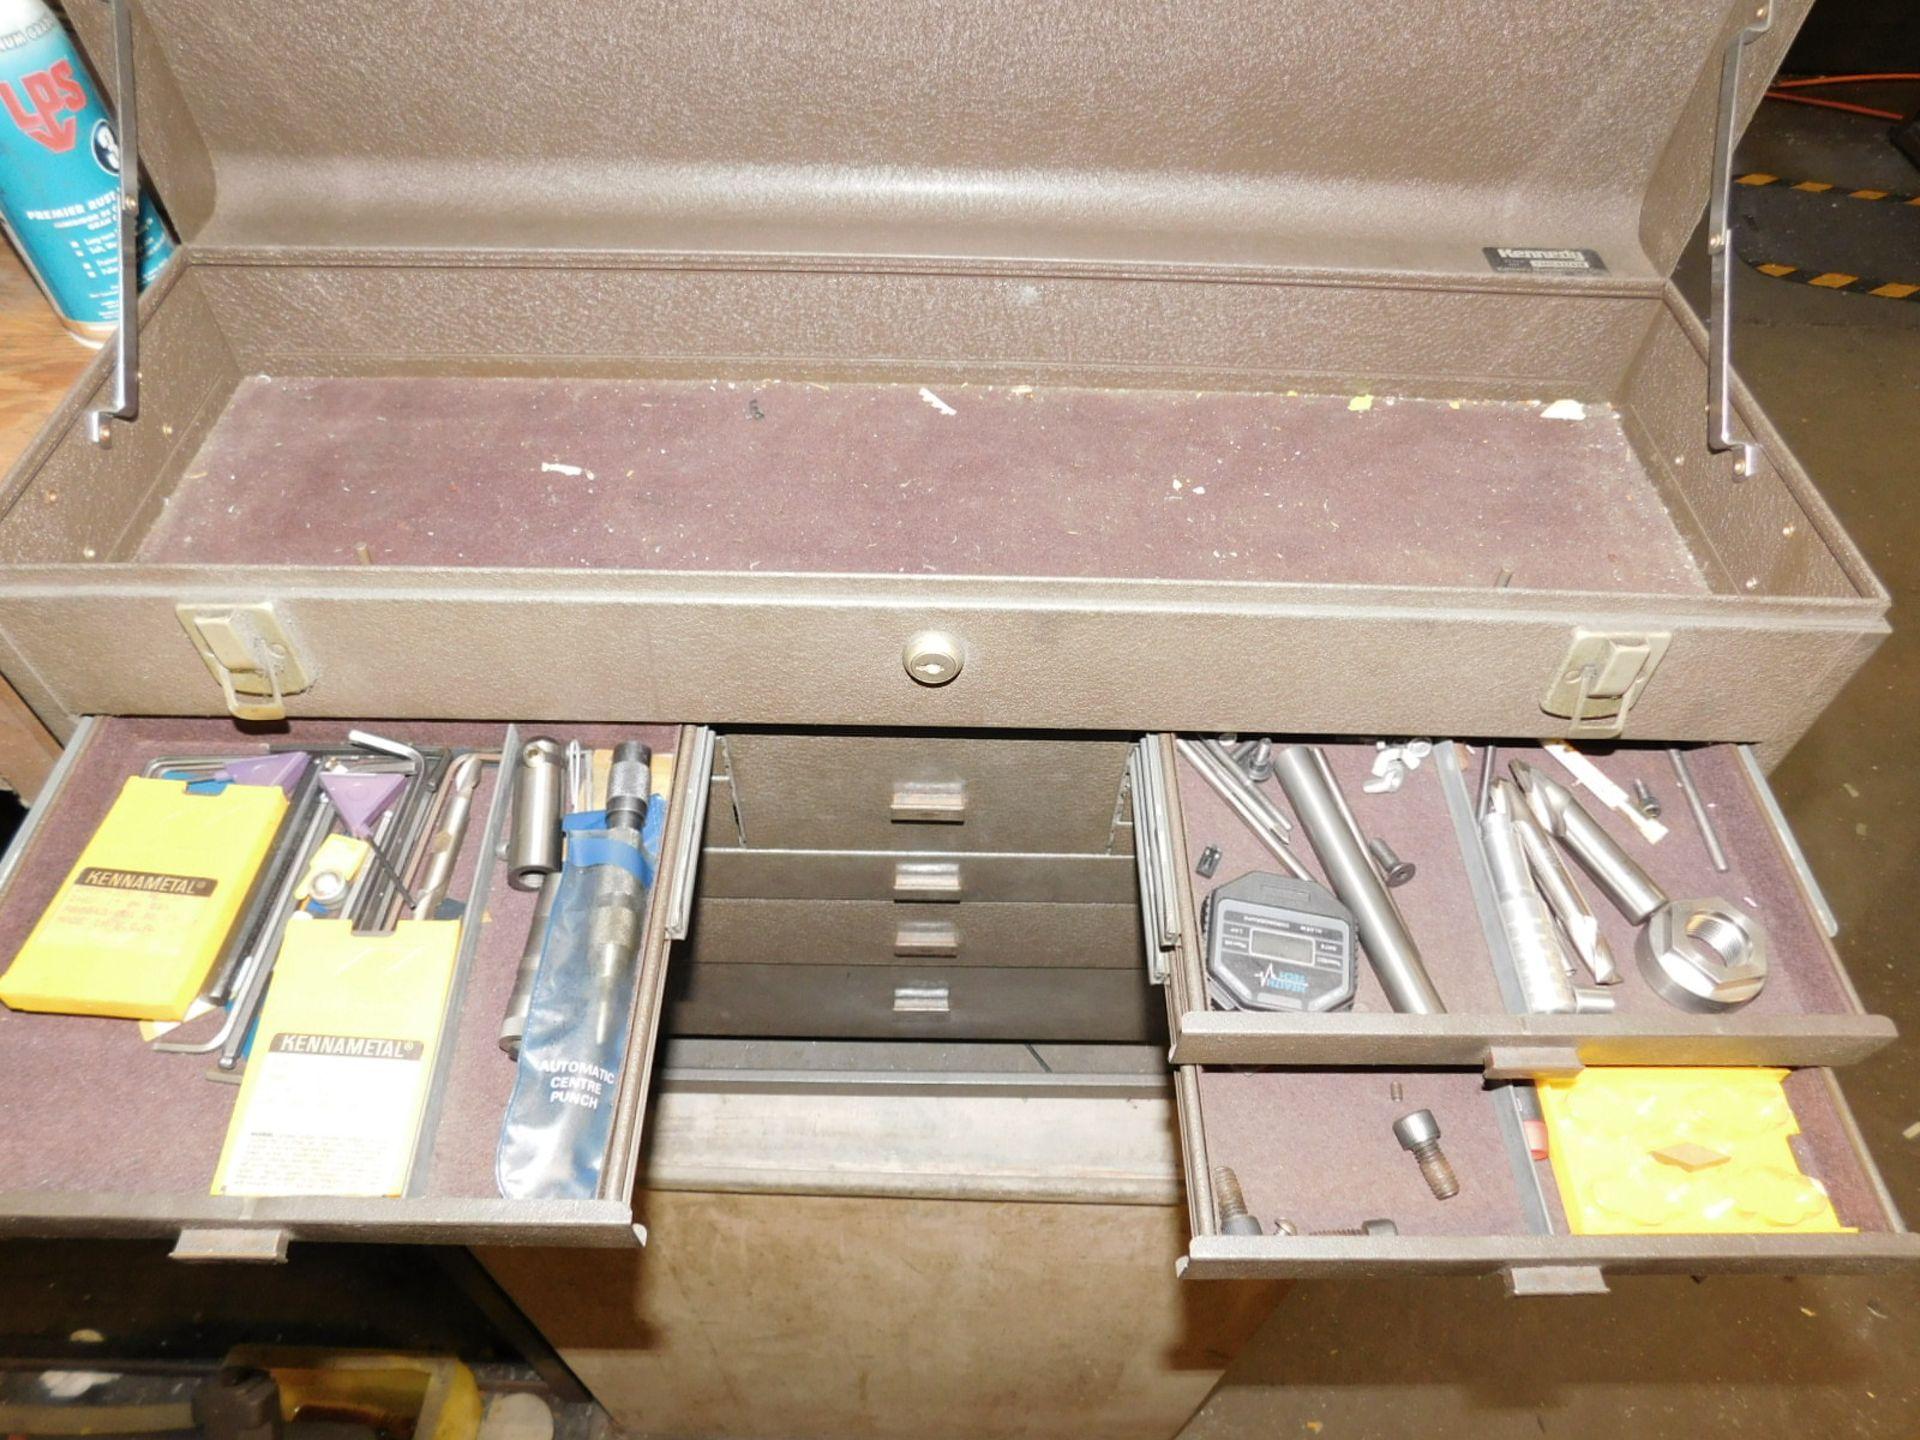 KENNEDY TOOL BOX, STYLE NO. 52611-627438, EMPTY, NEEDS NEW LOCK - Image 4 of 5